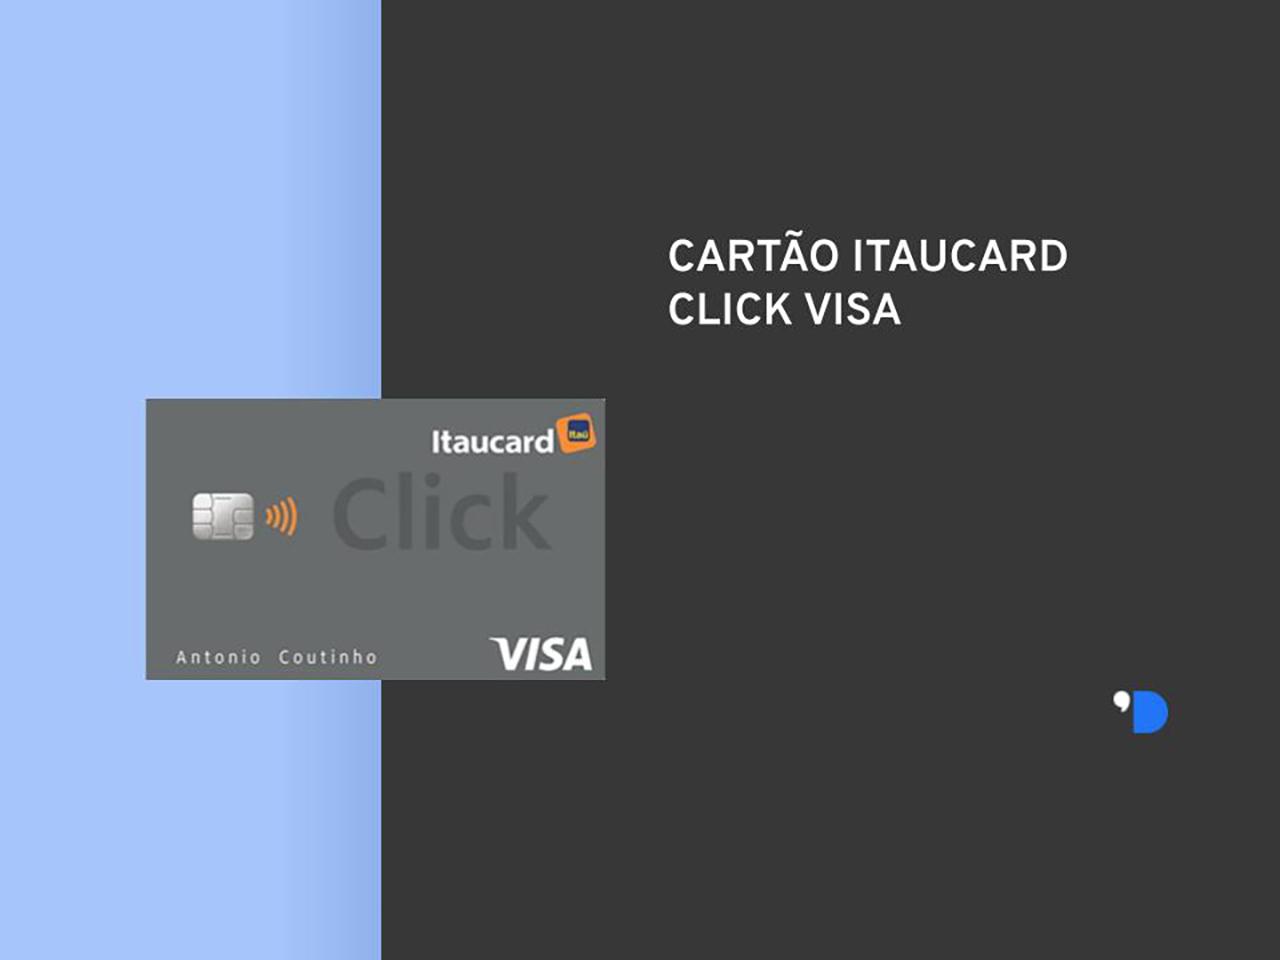 cartao-itaucard-click-visa